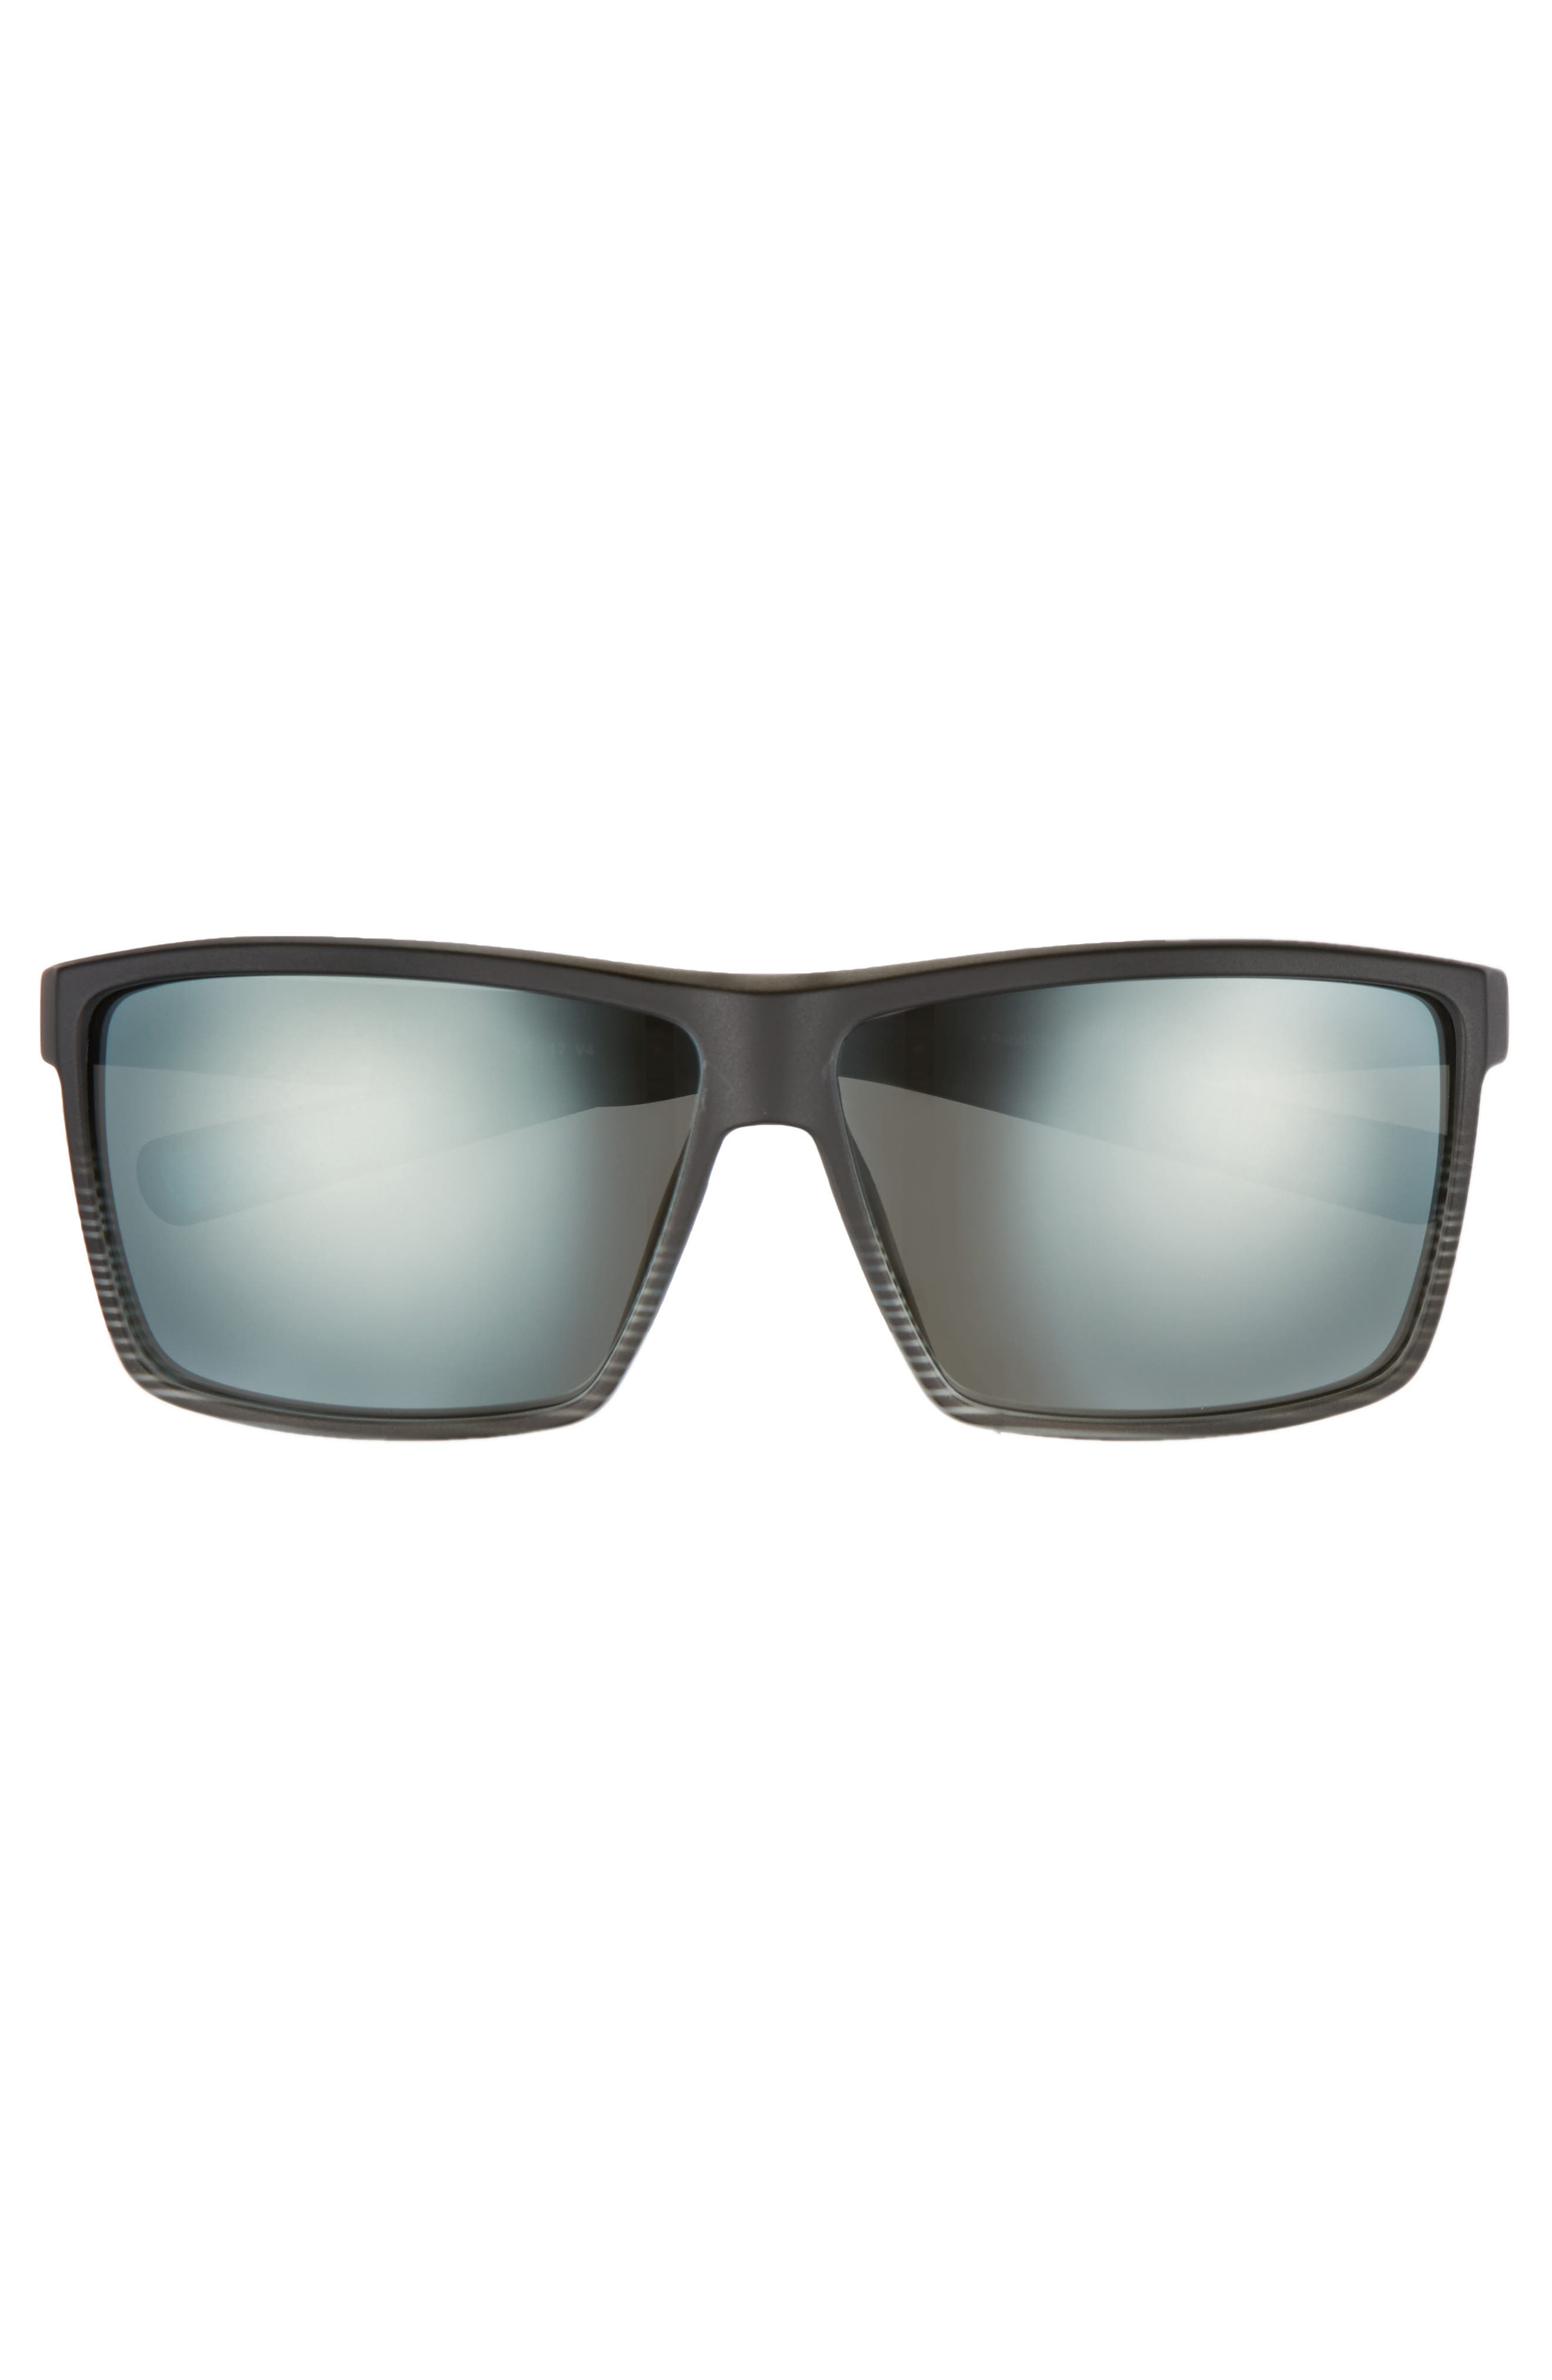 Rincon 60mm Polarized Sunglasses,                             Alternate thumbnail 2, color,                             021